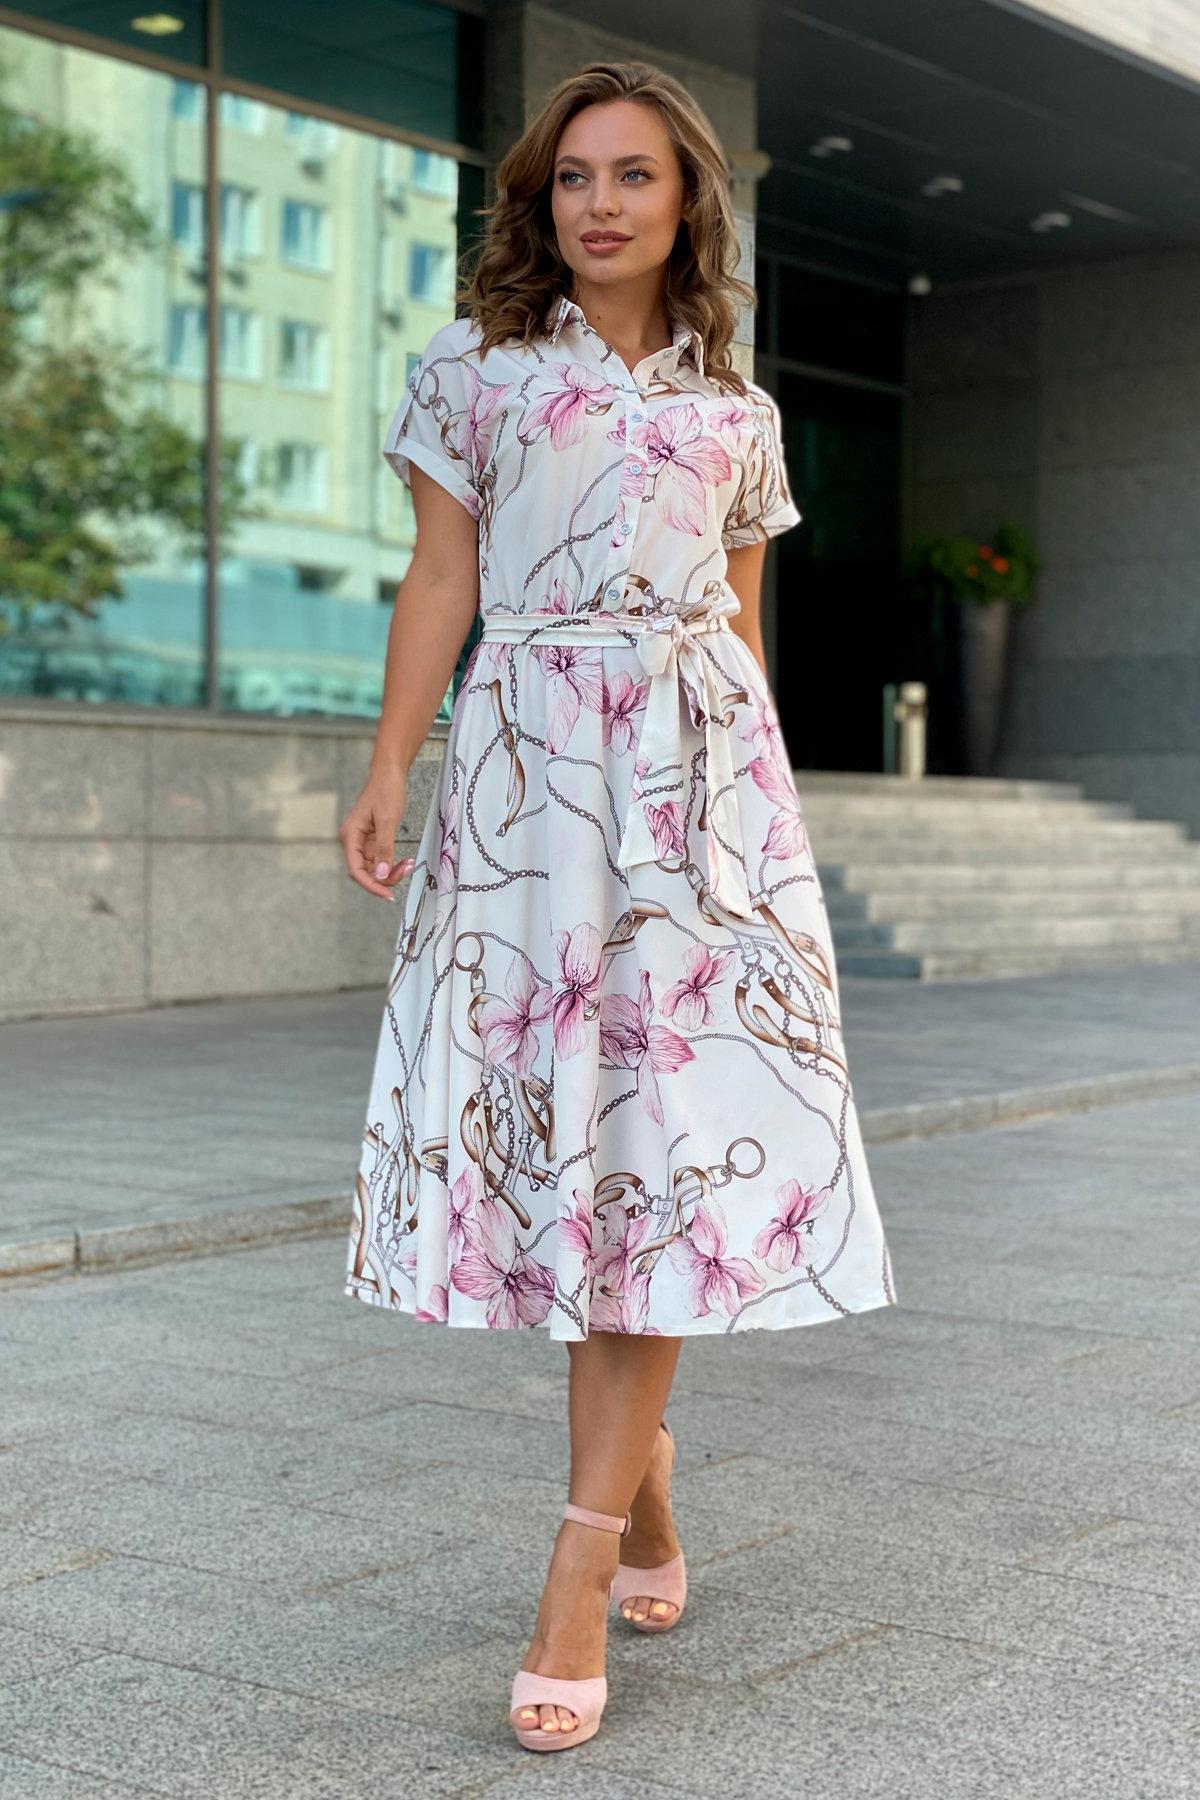 Платье Санжар 9090 АРТ. 45966 Цвет: Цветы кр/цепи Молоко/пудра - фото 5, интернет магазин tm-modus.ru